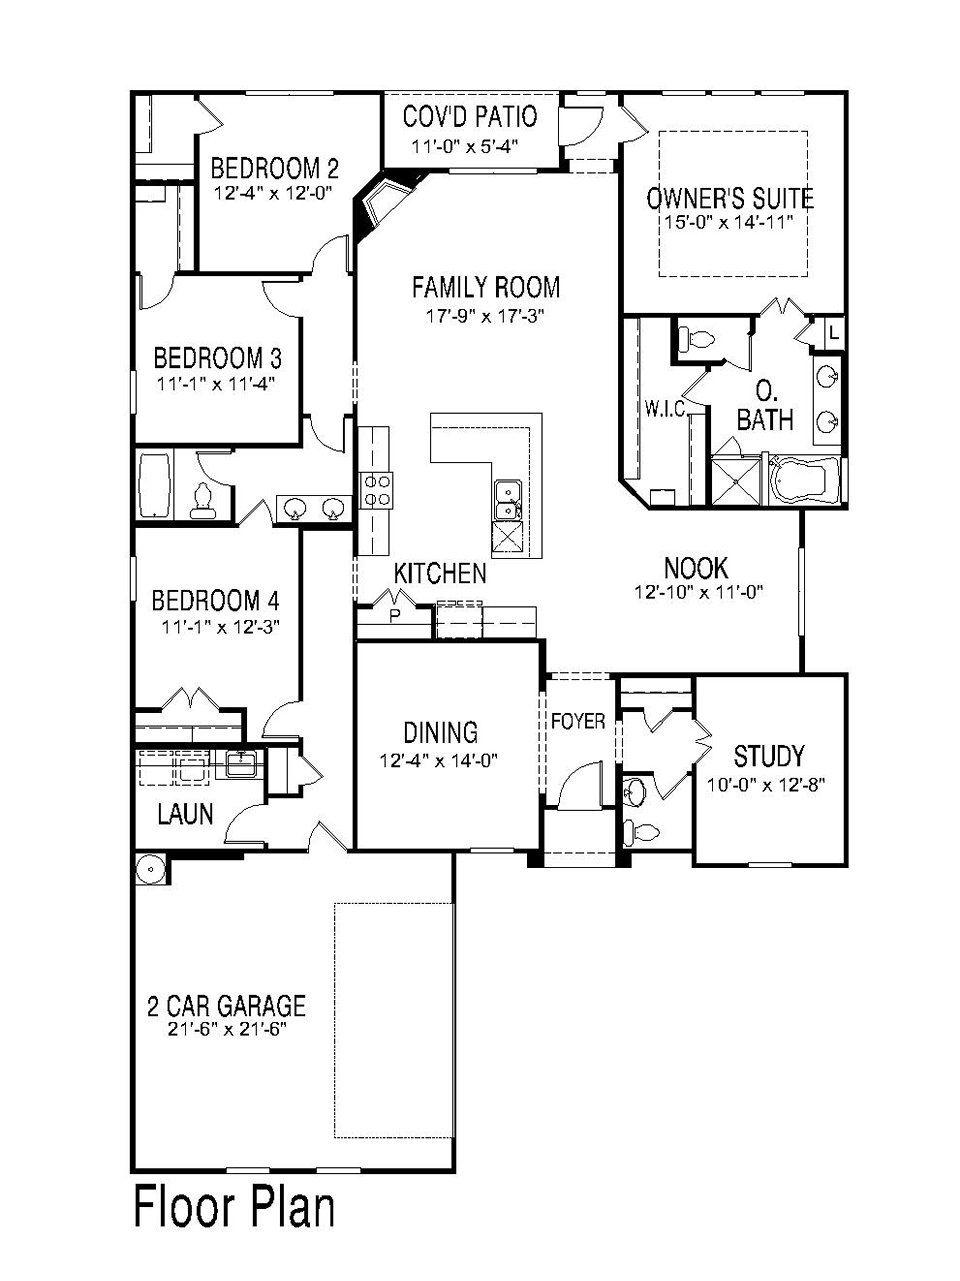 Floor Plan Payson Floor Plans Bathroom Floor Plans How To Plan